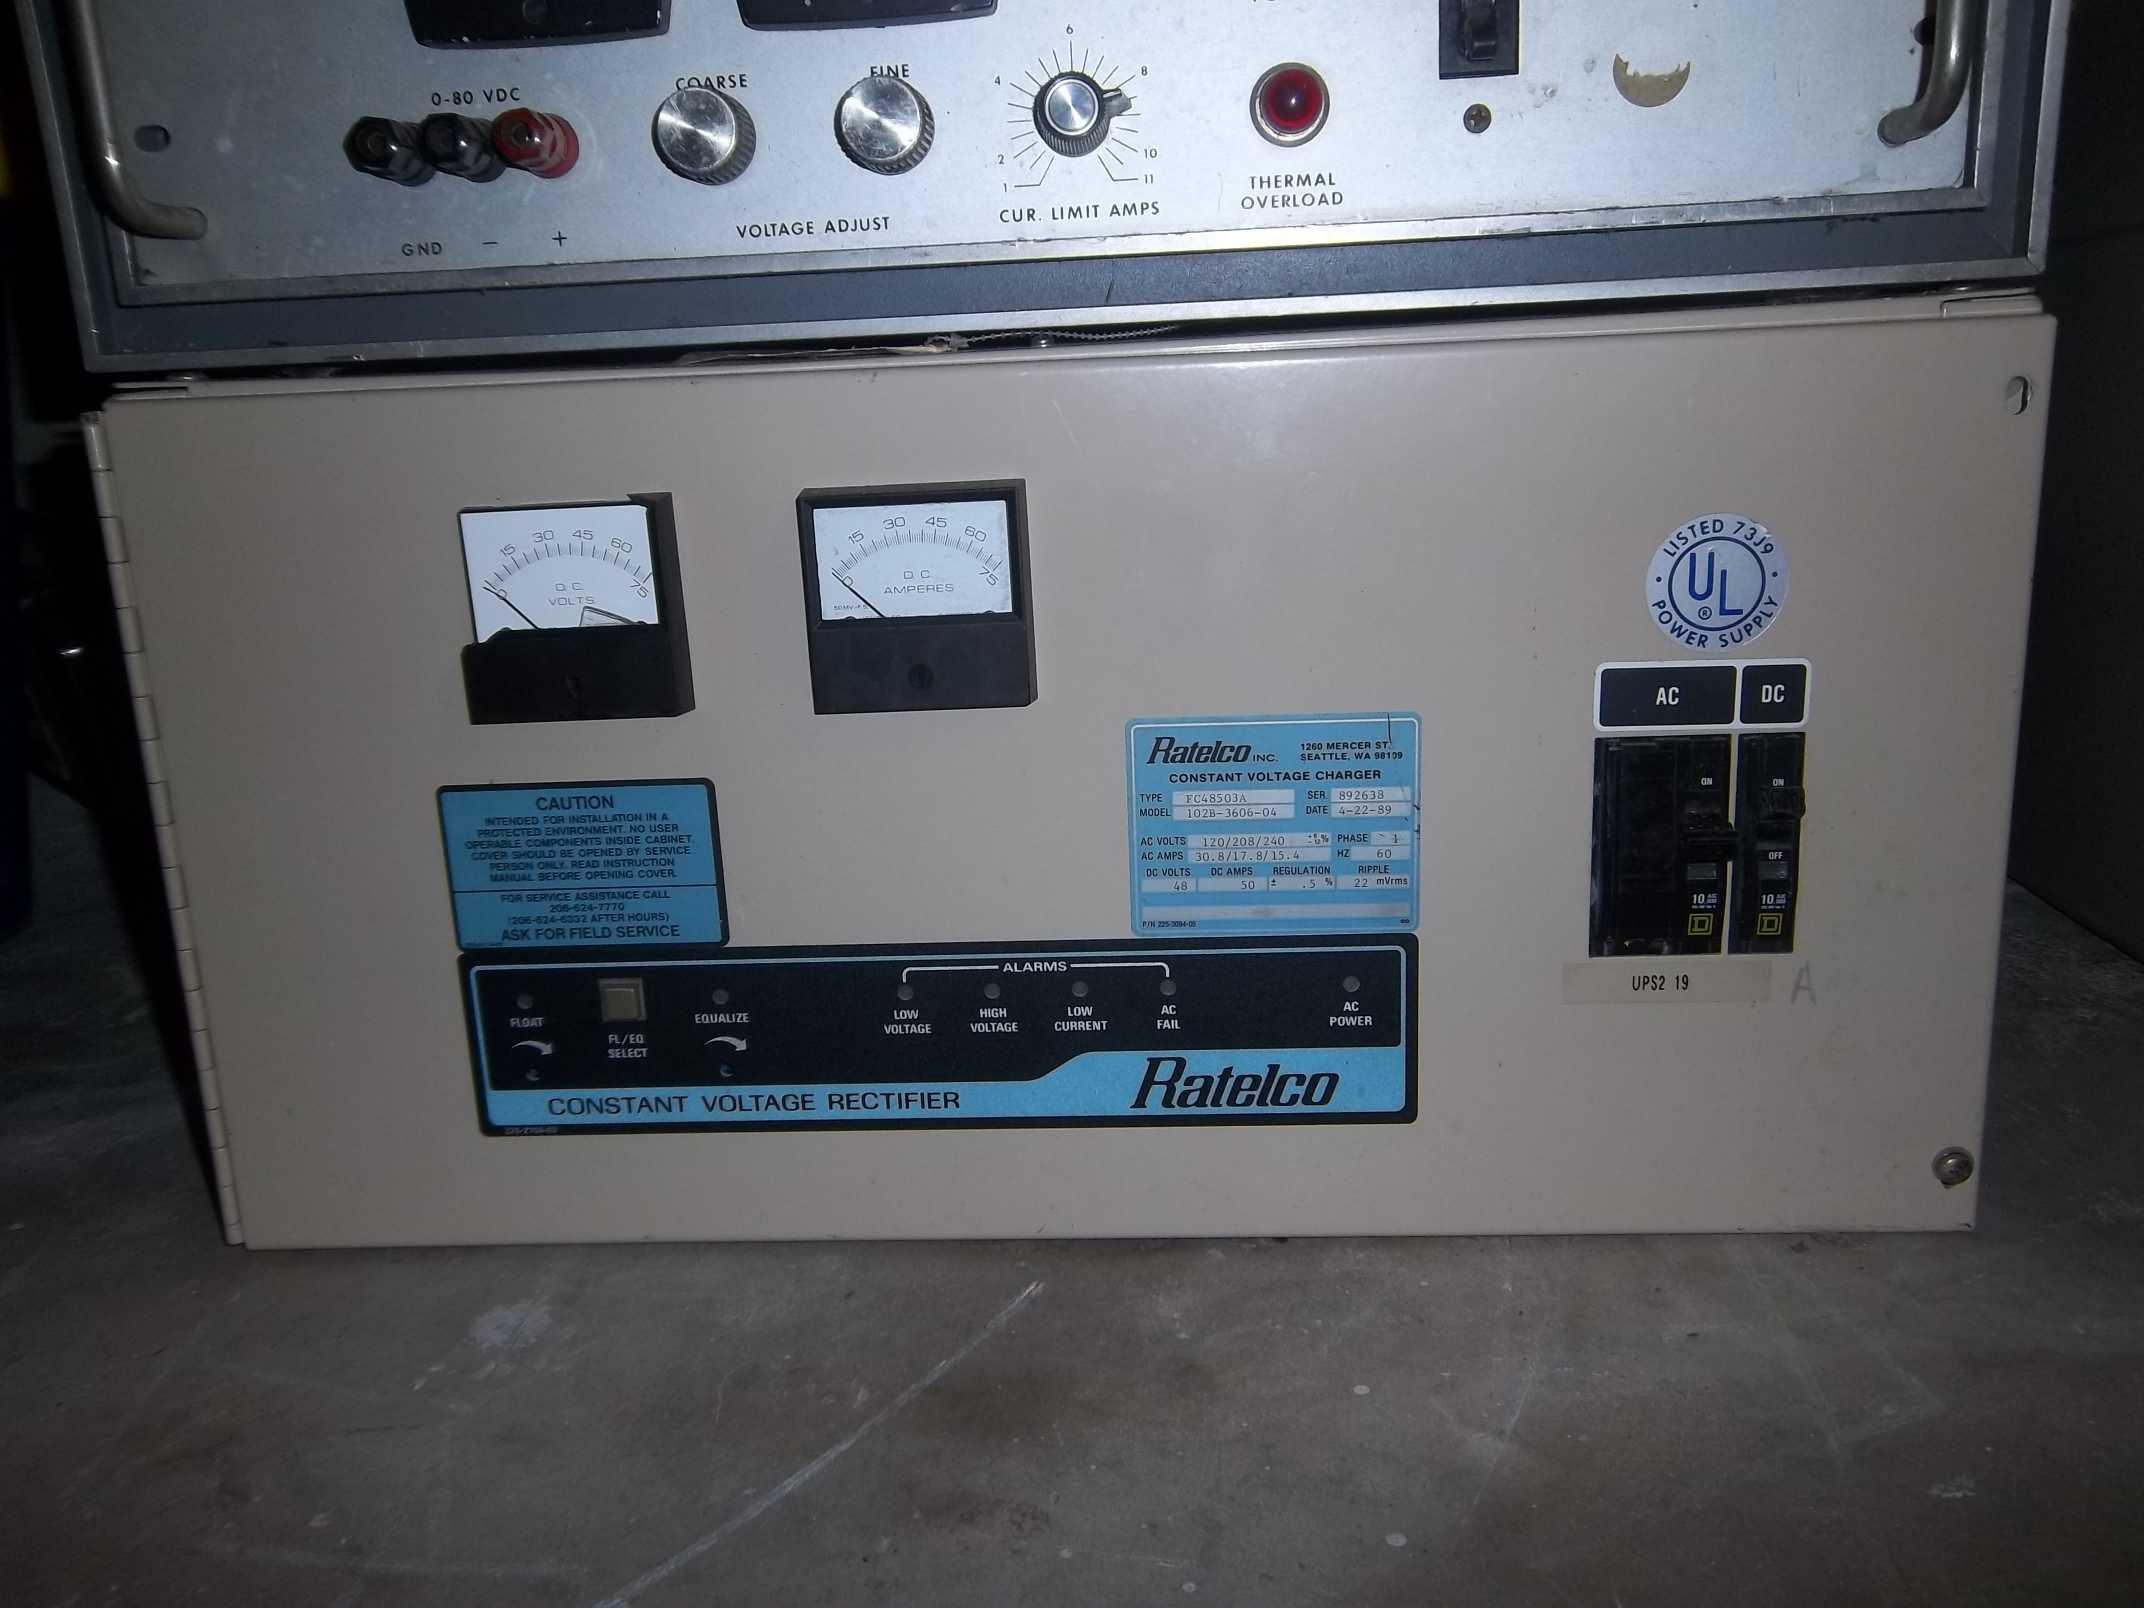 Eric's Warehouse - Ratelco model 102b-3606-04 rectifier 48V